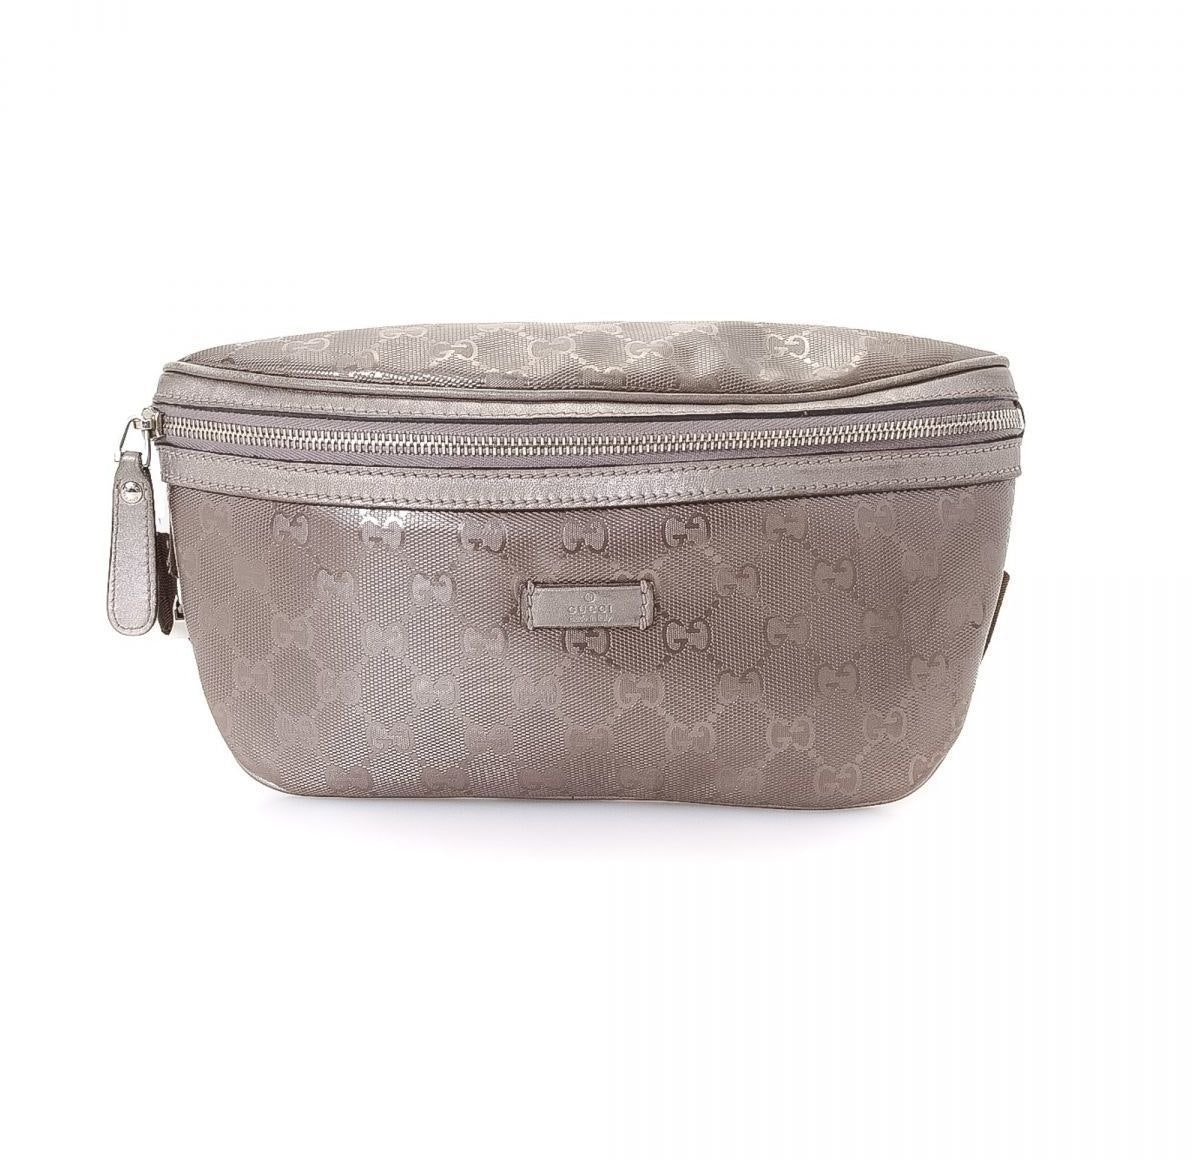 Gucci Pouch Waist Monogram GG Imprime Metalic Grey